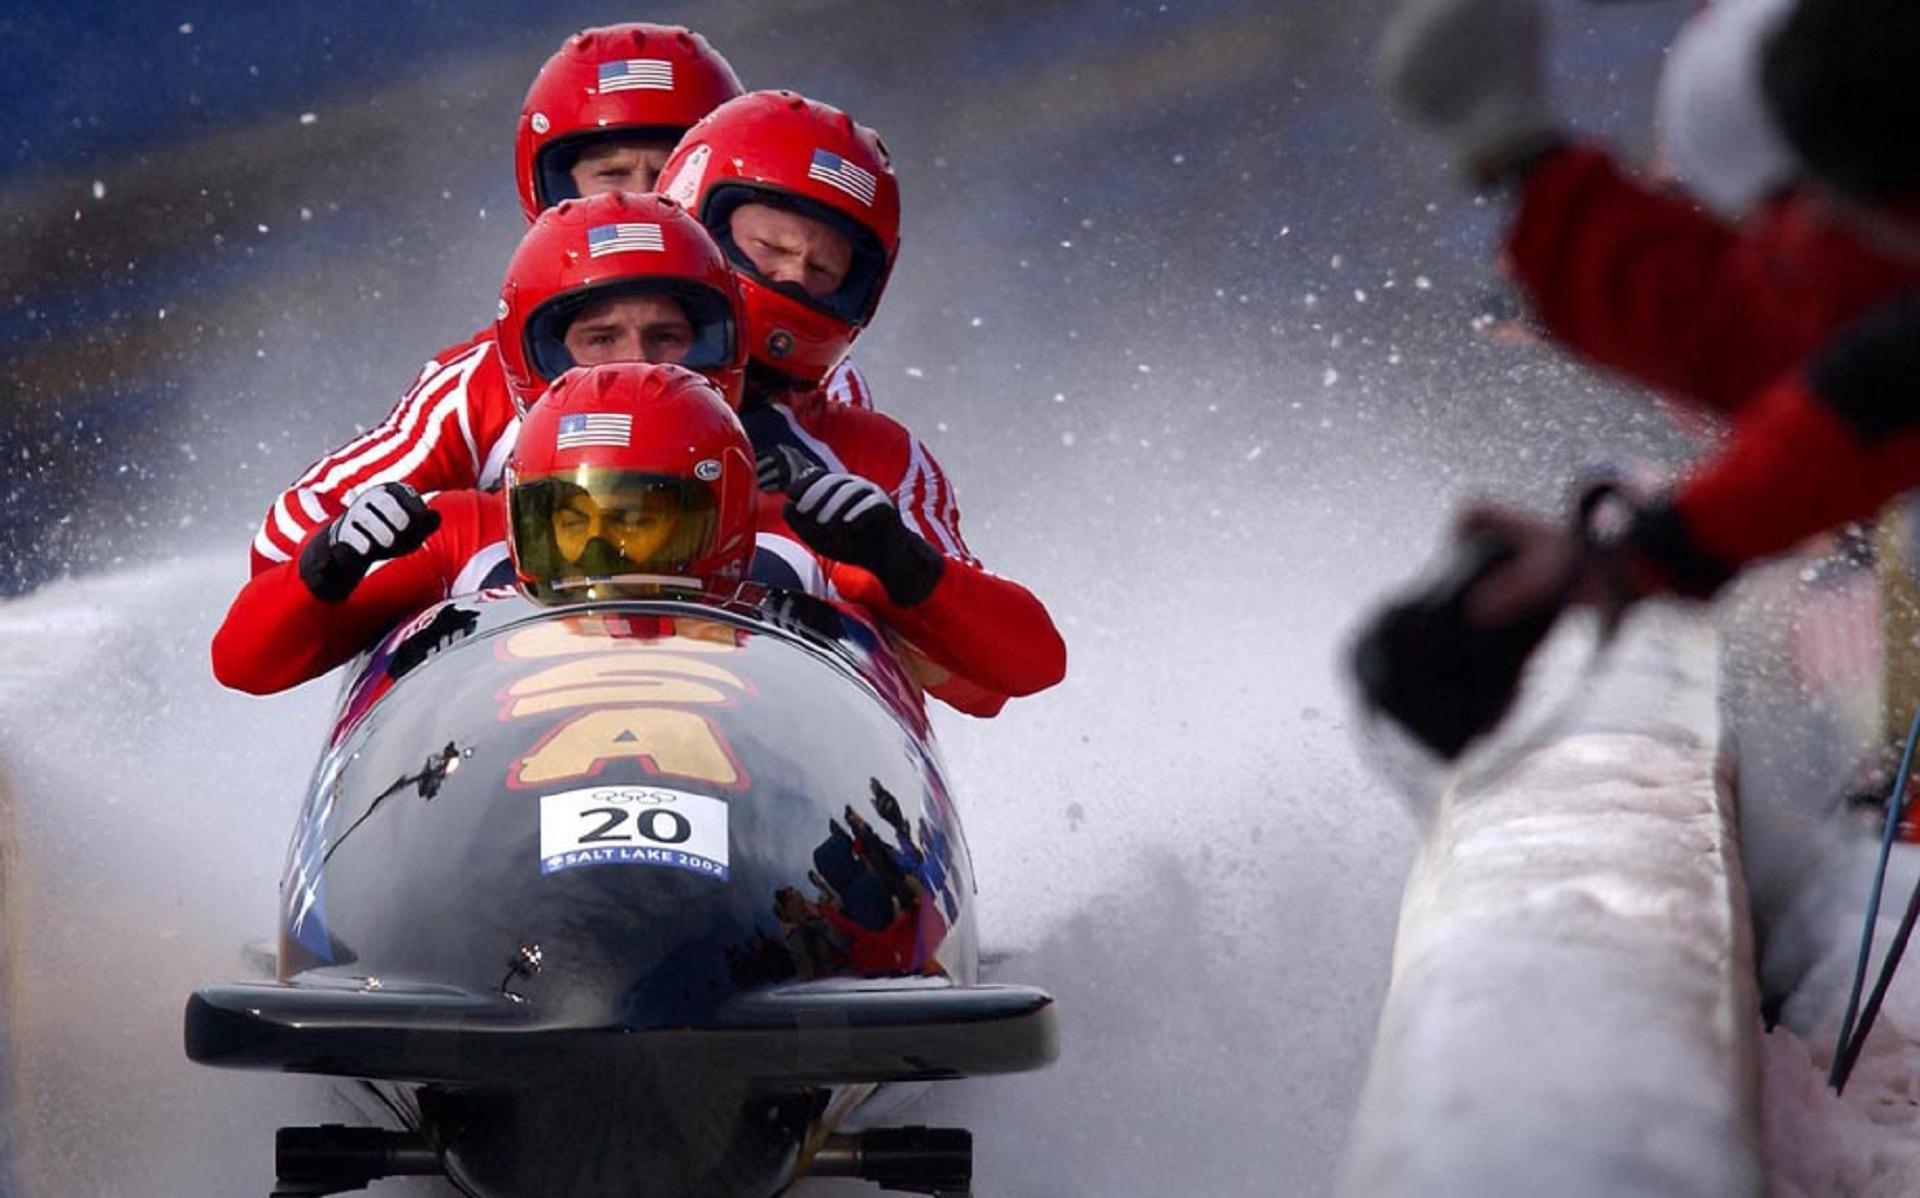 bobsled-team-run-olympics-38631.jpeg